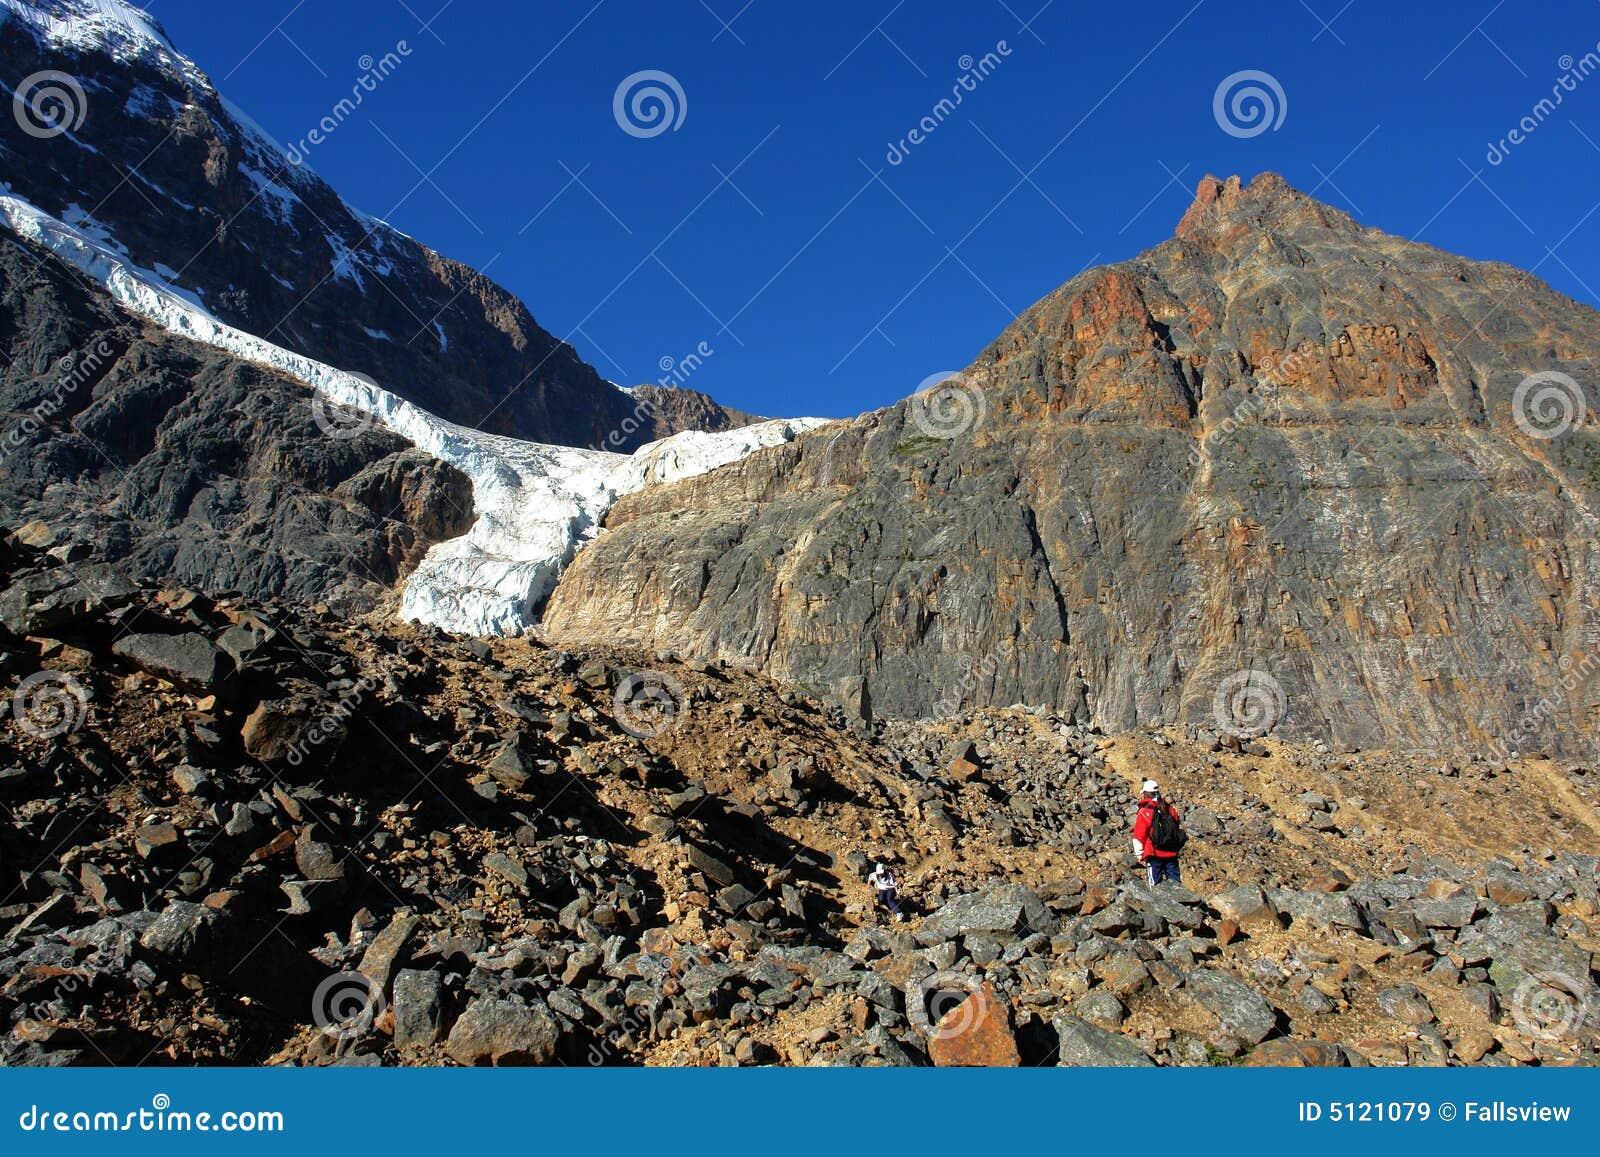 Mountain edith and glacier